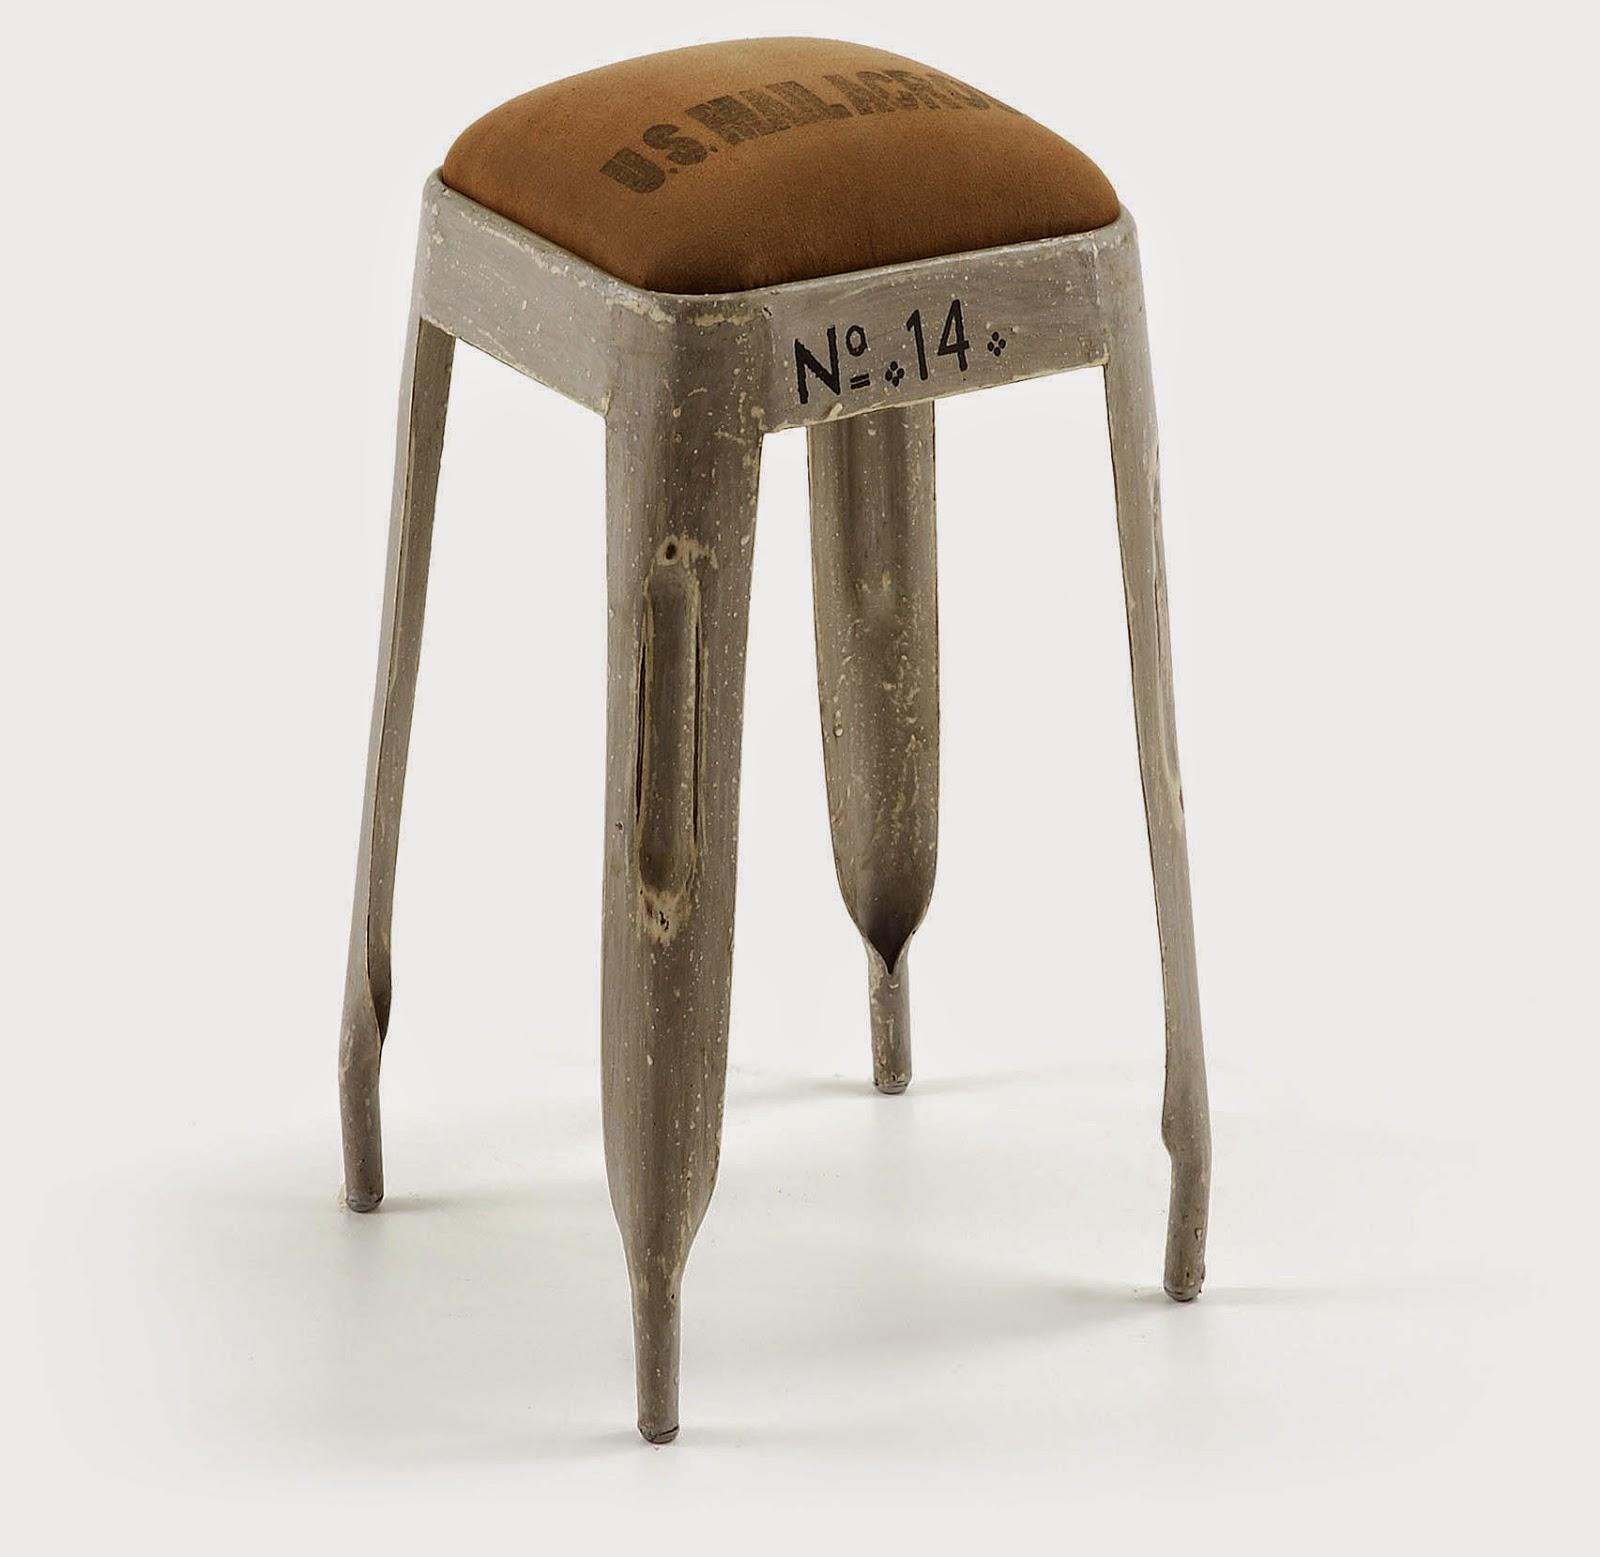 http://www.portobellostreet.es/mueble/27309/Taburete-gris-Vintage-Hubbs